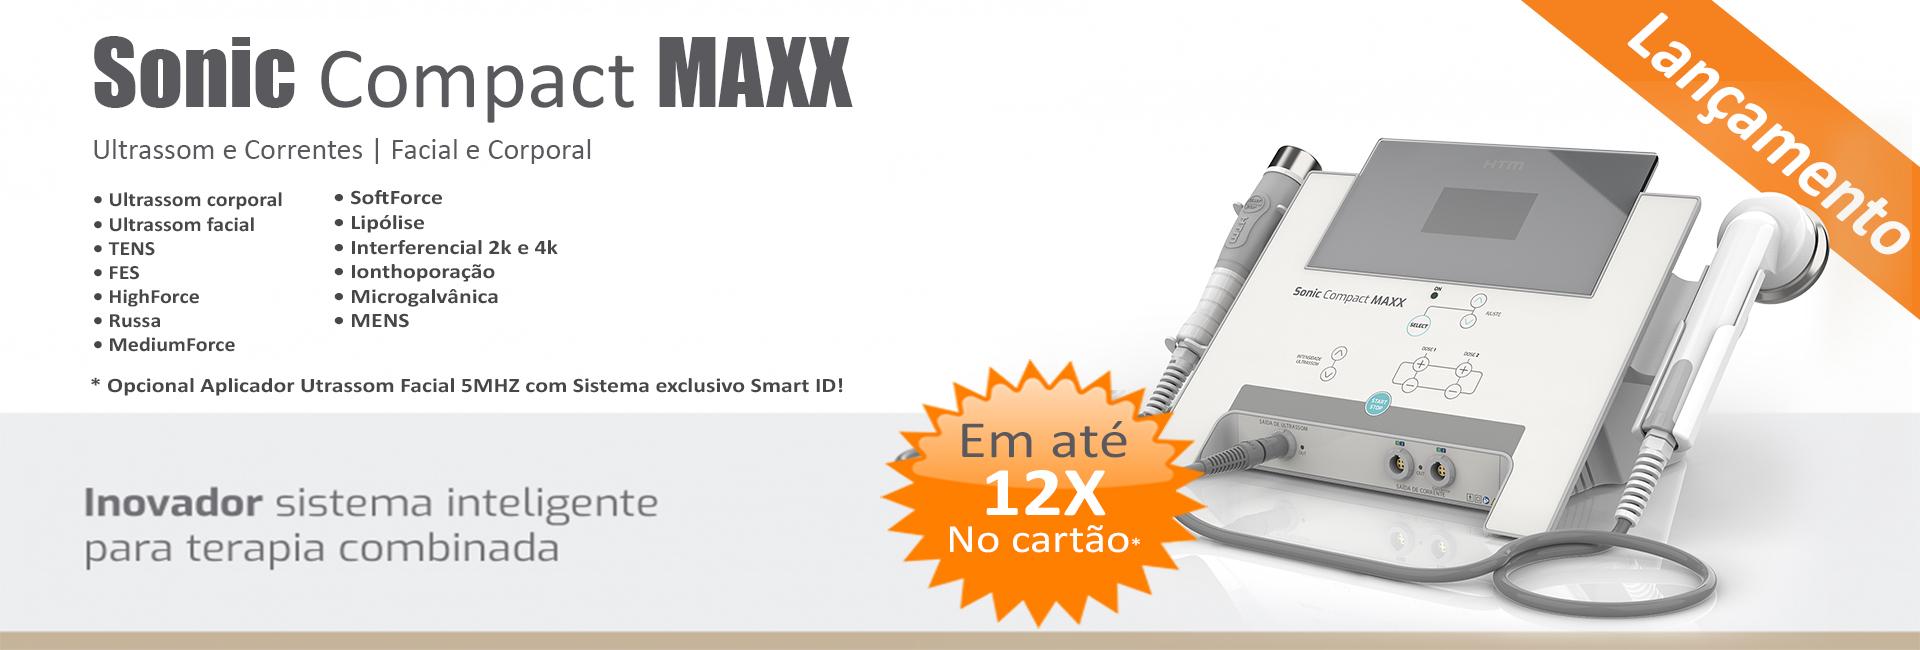 Sonic-compact-maxx